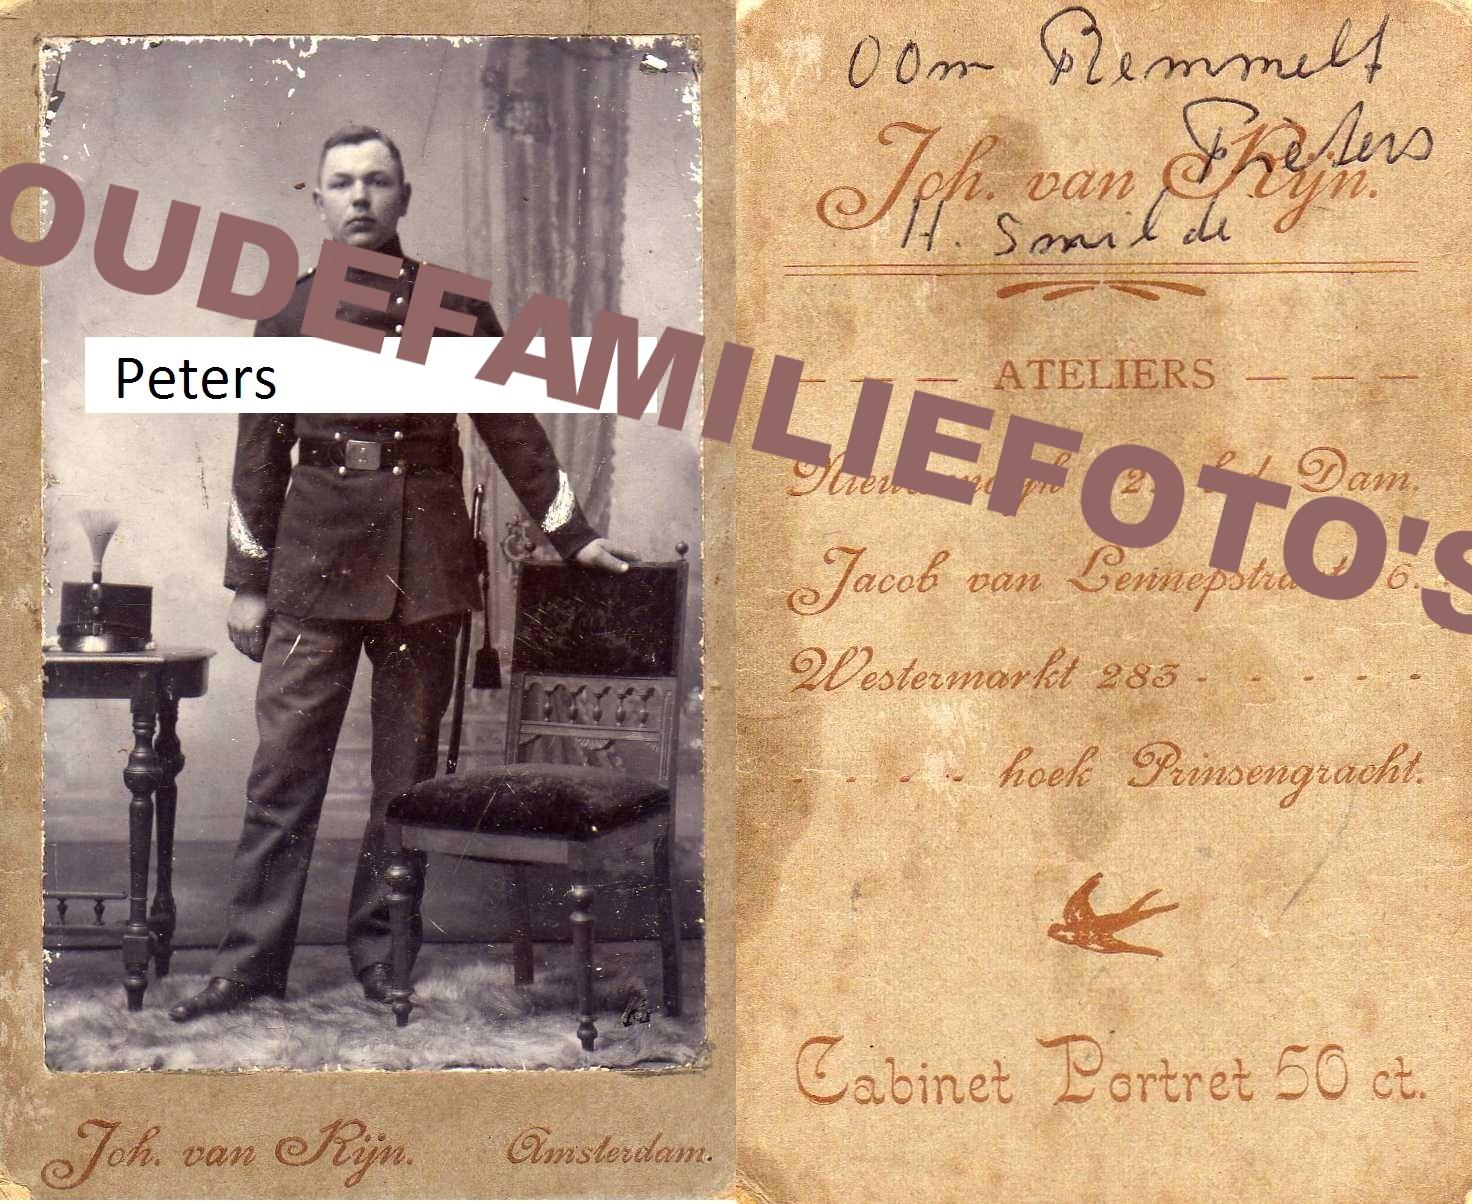 99% Peters, Remmelt Wilhelm. geb 1869 Staphorst.